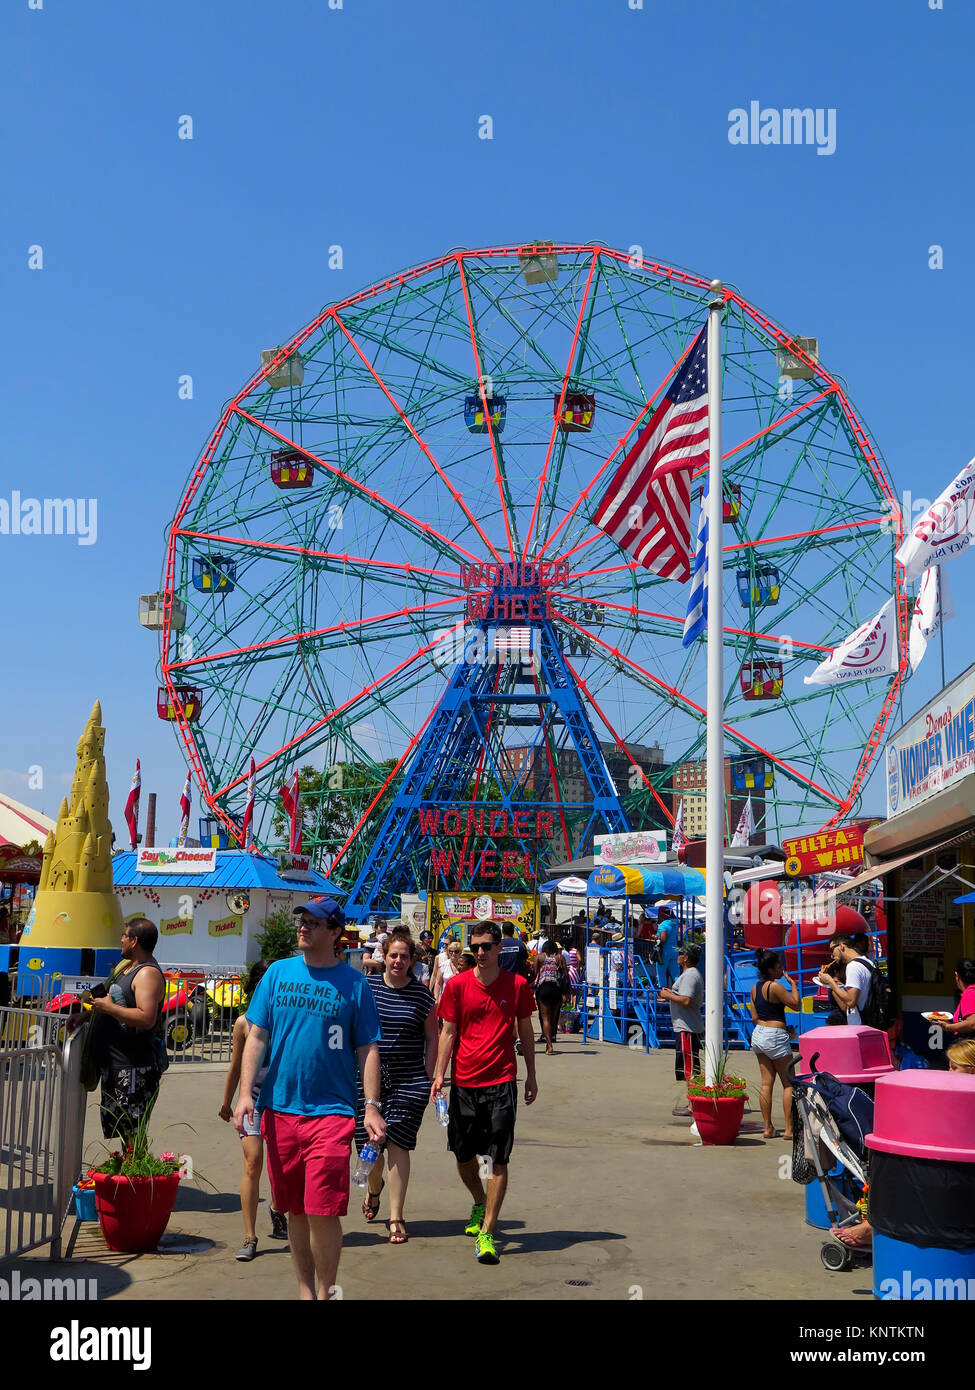 denkmalgeschütztes Riesenrad WONDER WHEEL(1918), amusement park, boardwalk, Coney Island, Brooklyn, New York, - Stock Image